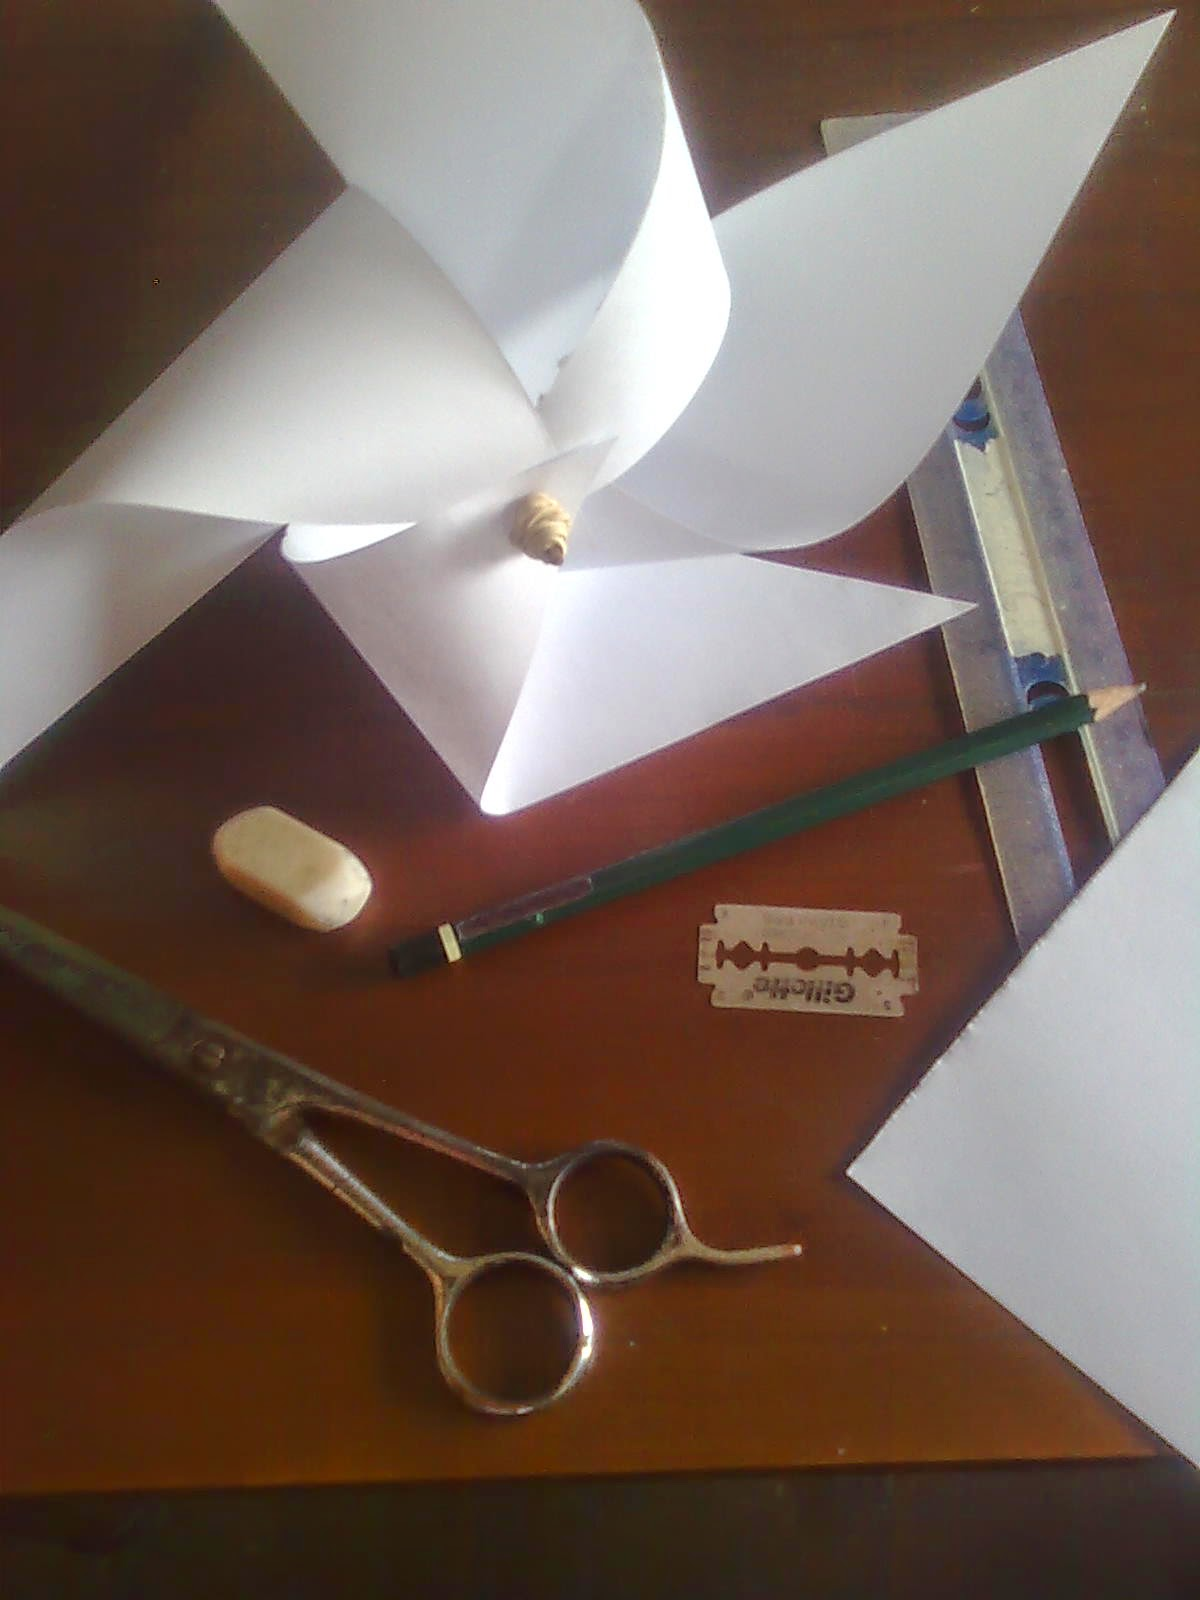 Cara Membuat Kincir Angin Dari Sedotan : membuat, kincir, angin, sedotan, BUKAN, HERBIVORA:, Membuat, Kincir, Angin, Kitiran, Sederhana, Kertas